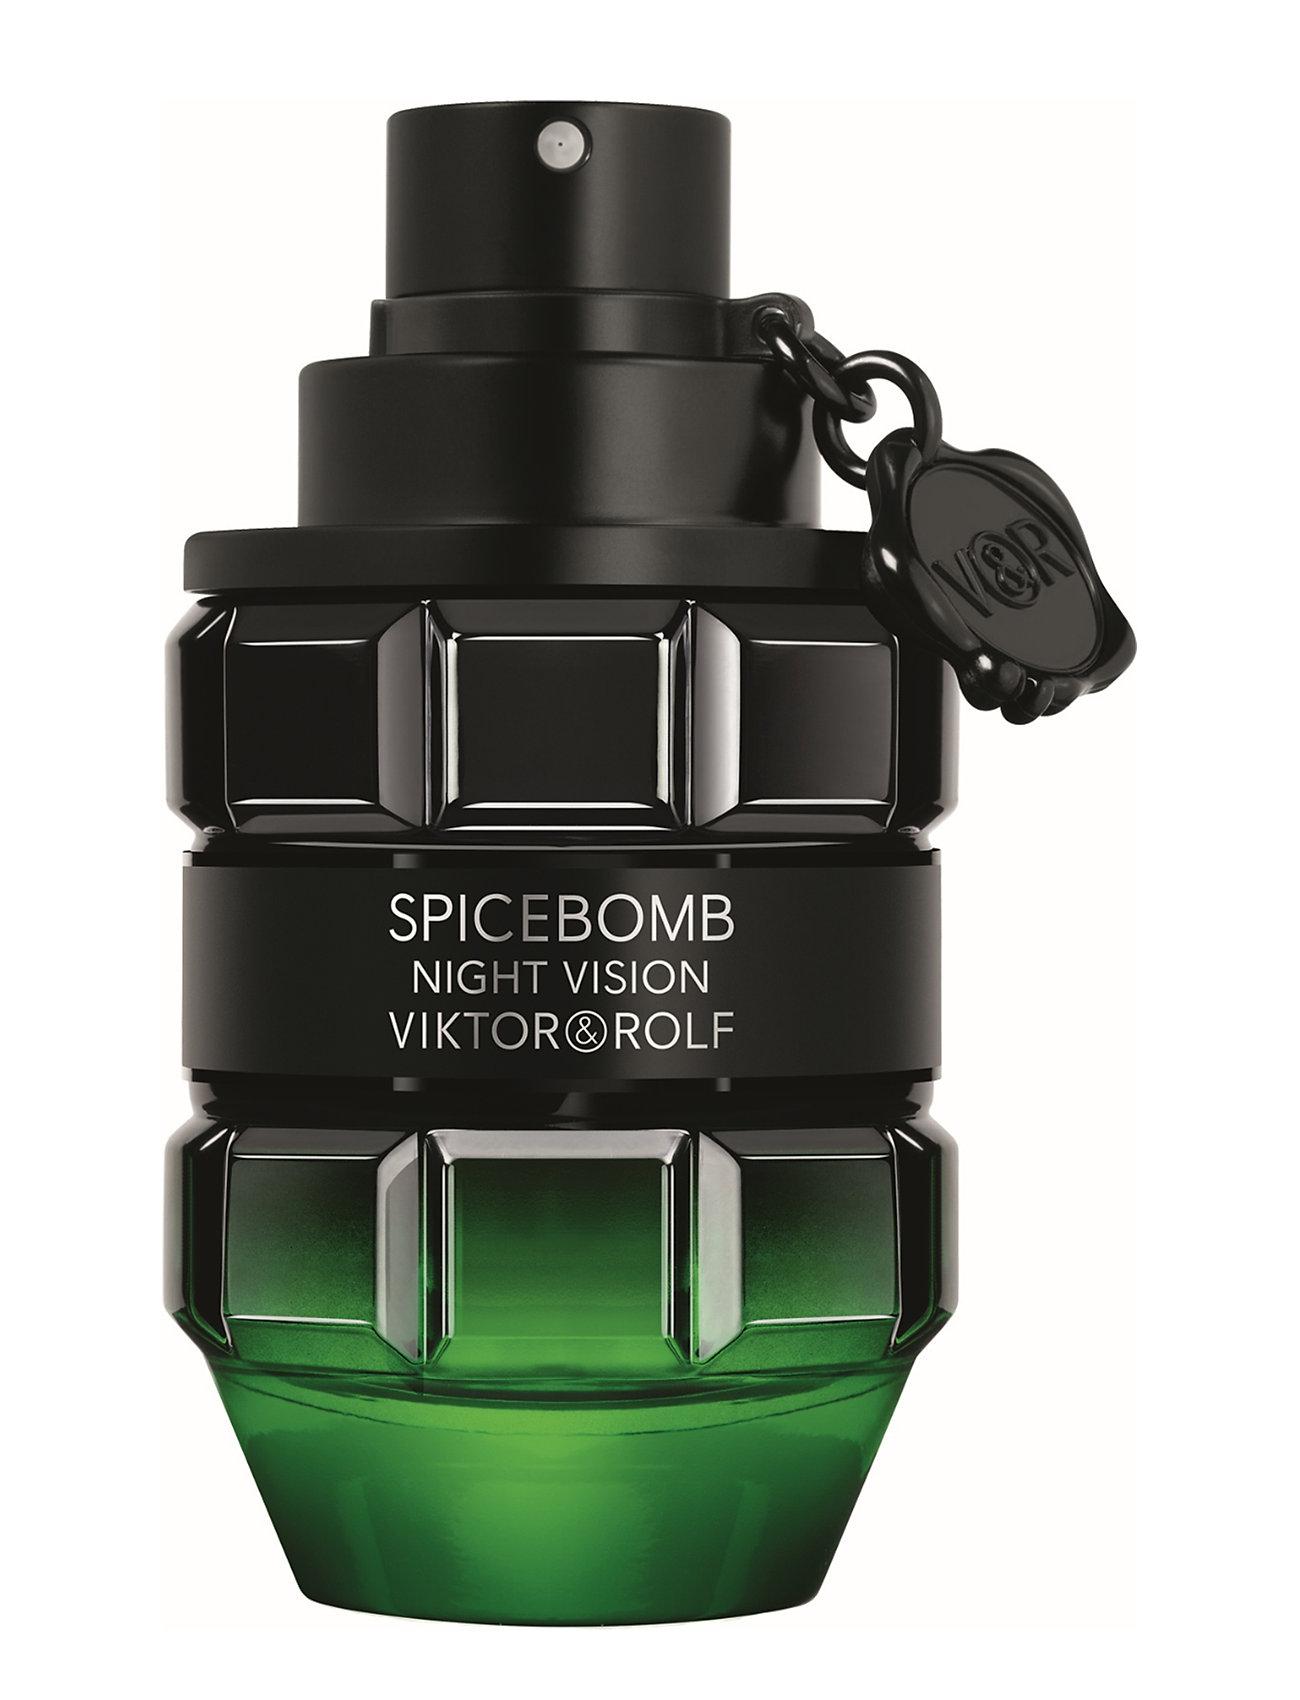 Viktor & Rolf Spicebomb Night Vision Edt 50 ml - CLEAR